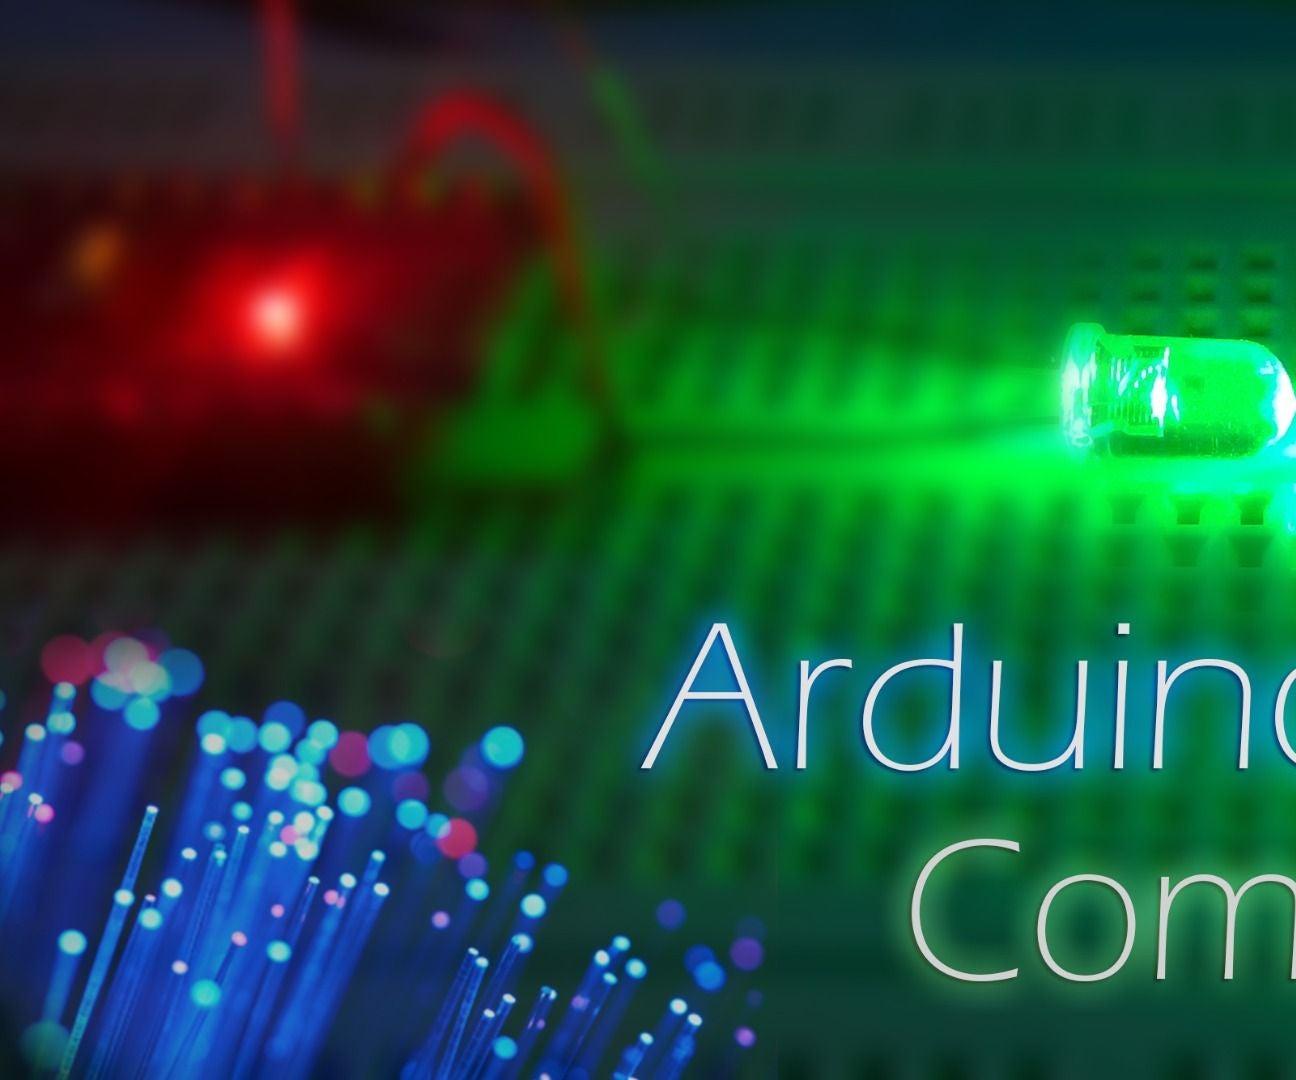 Arduino Communication 5 Steps Infrared Proximity Sensor Circuit